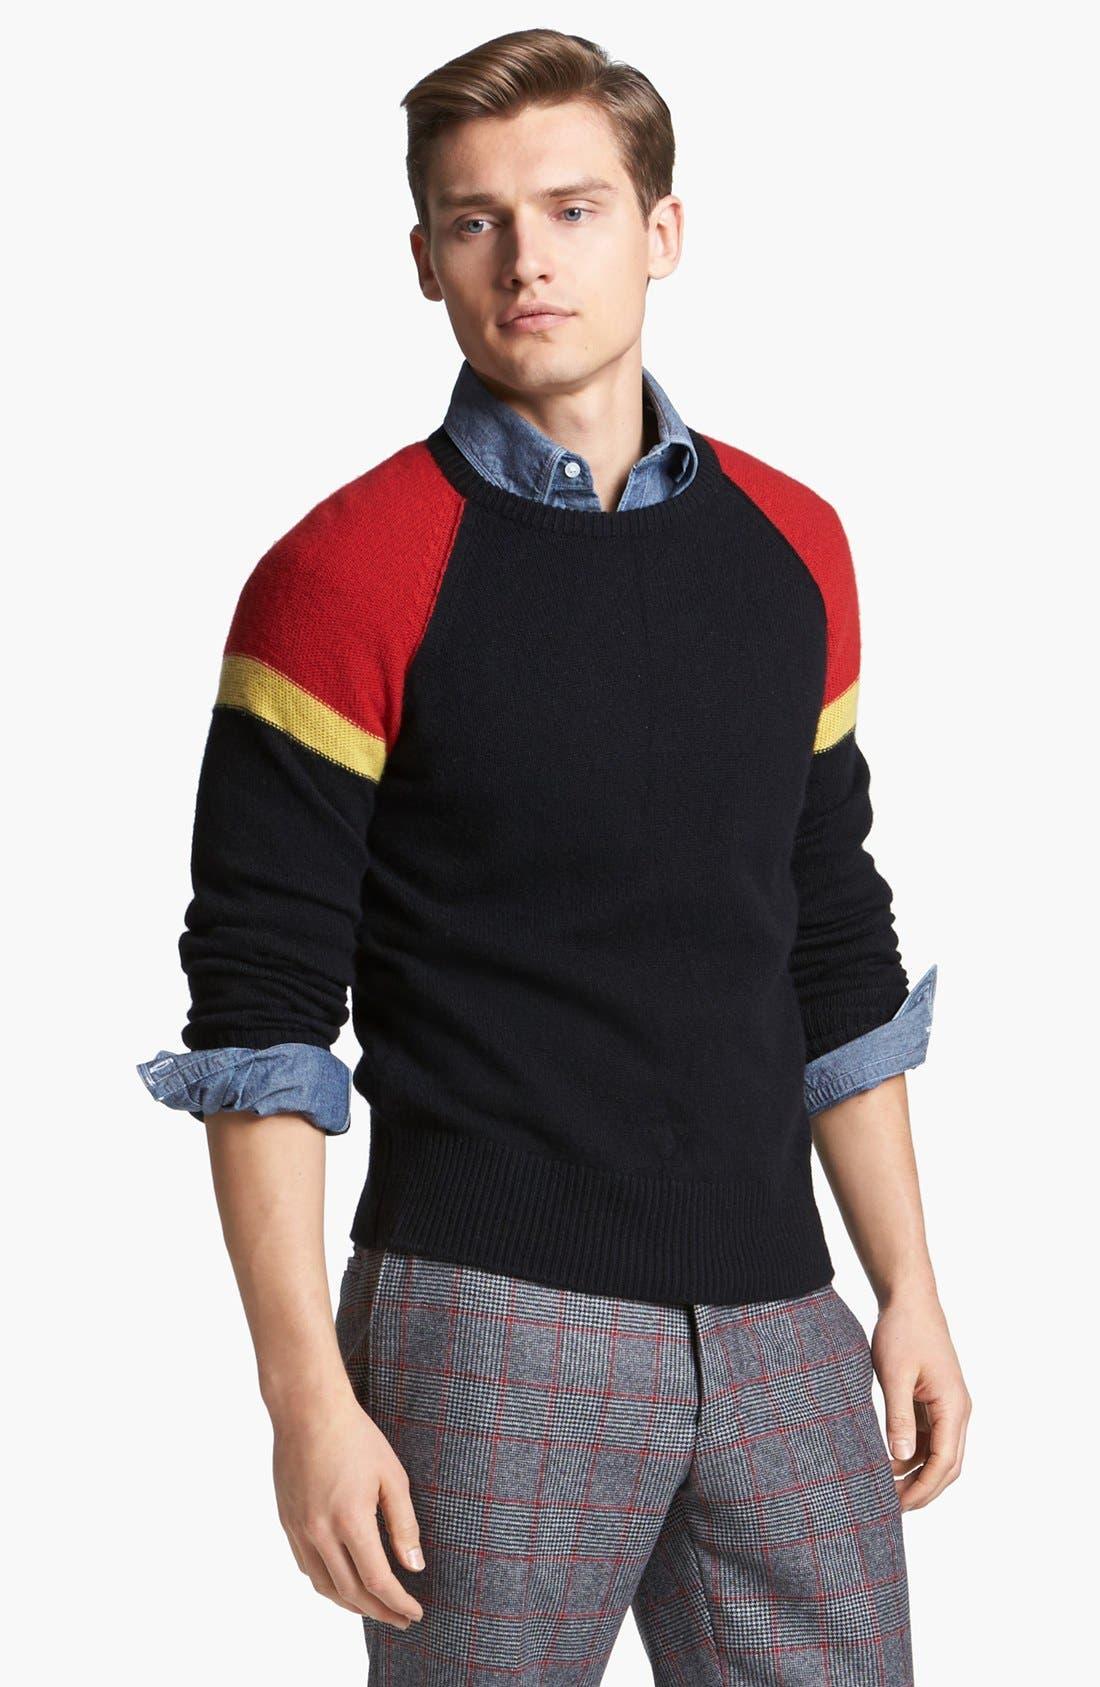 MICHAEL BASTIAN Cashmere Crewneck Sweater, Main, color, 001